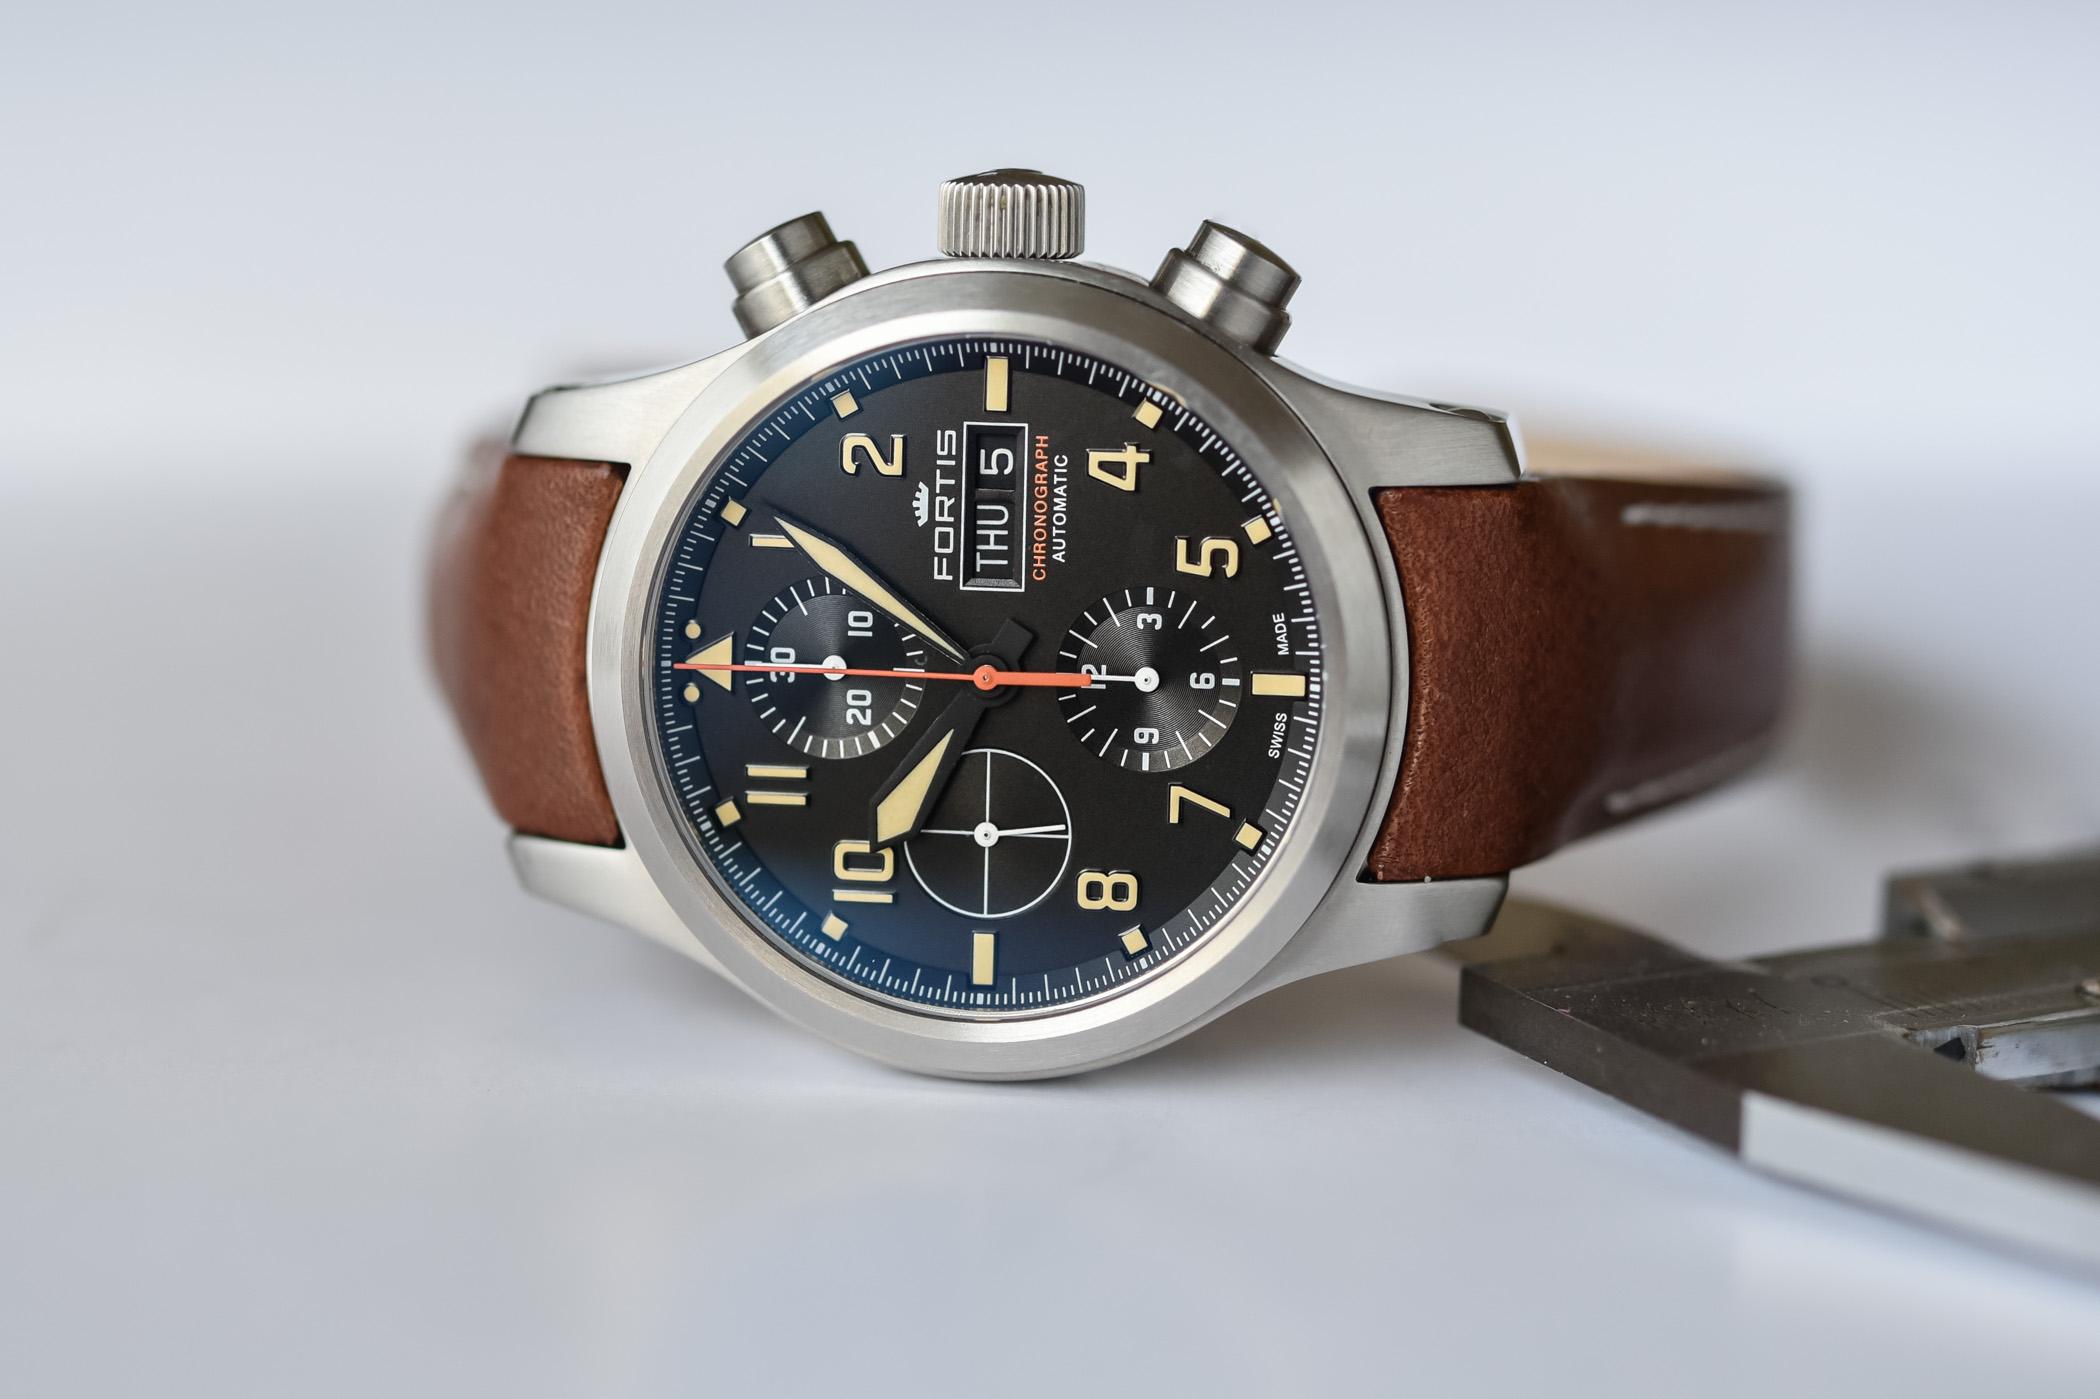 Fortis Aeromaster Old Radium Chronograph